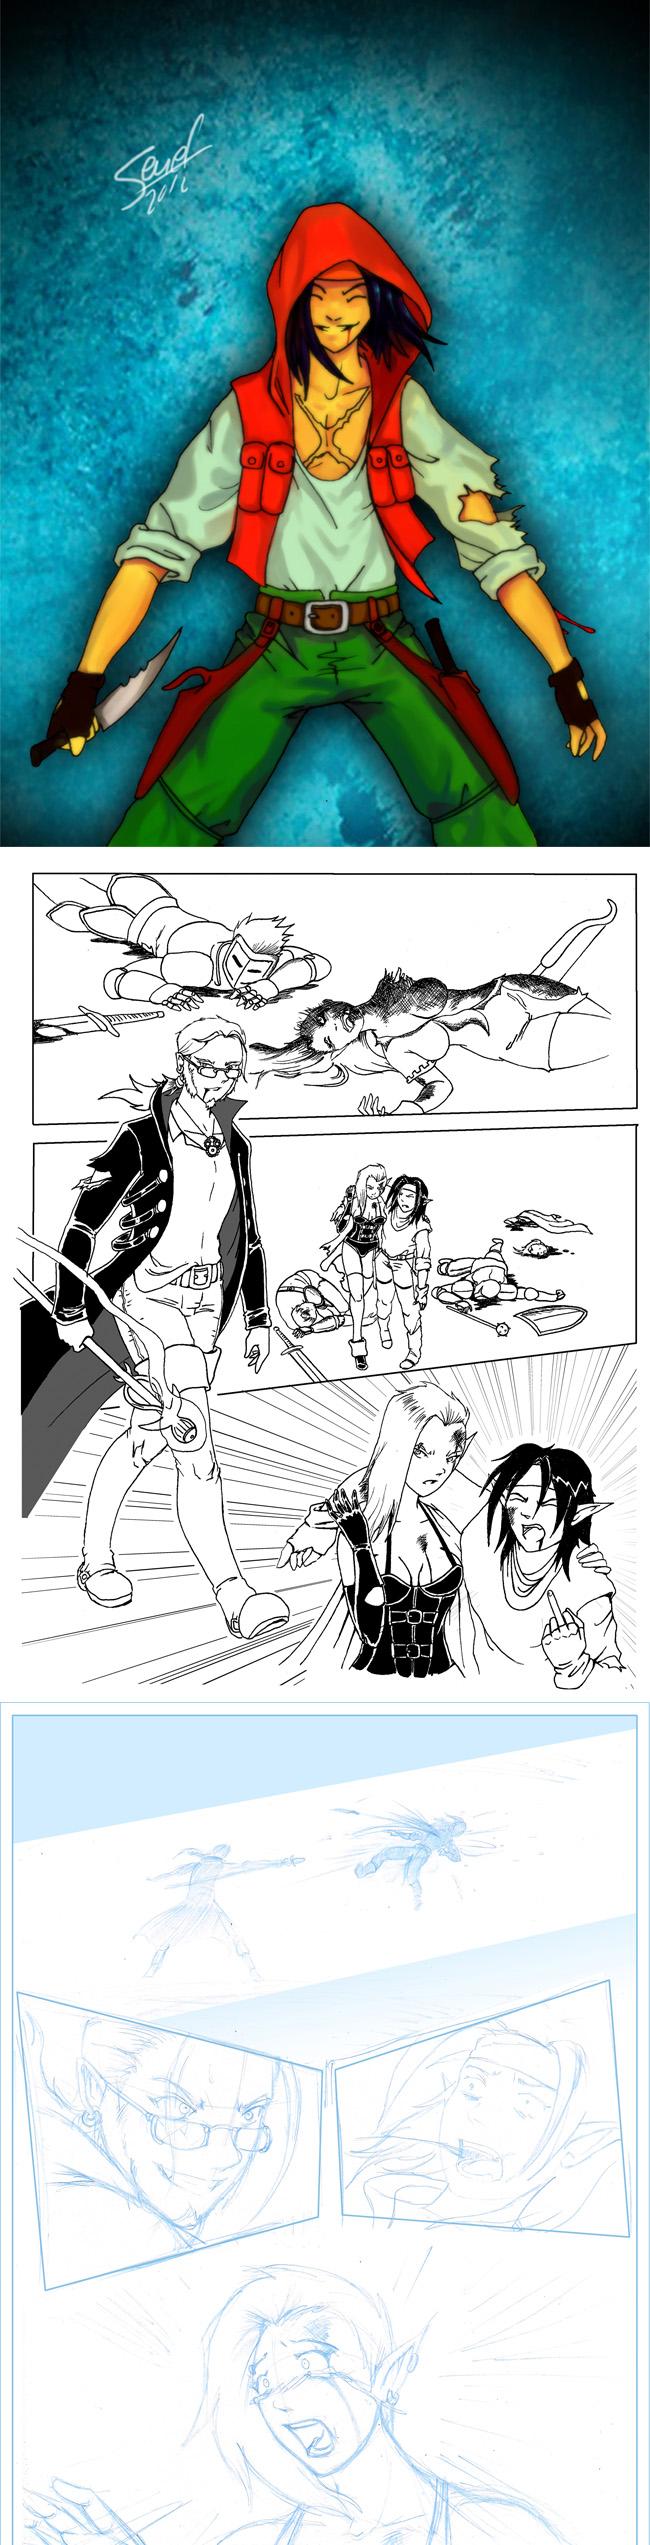 manga-madrid-comic-aprender-academiac10-kosen